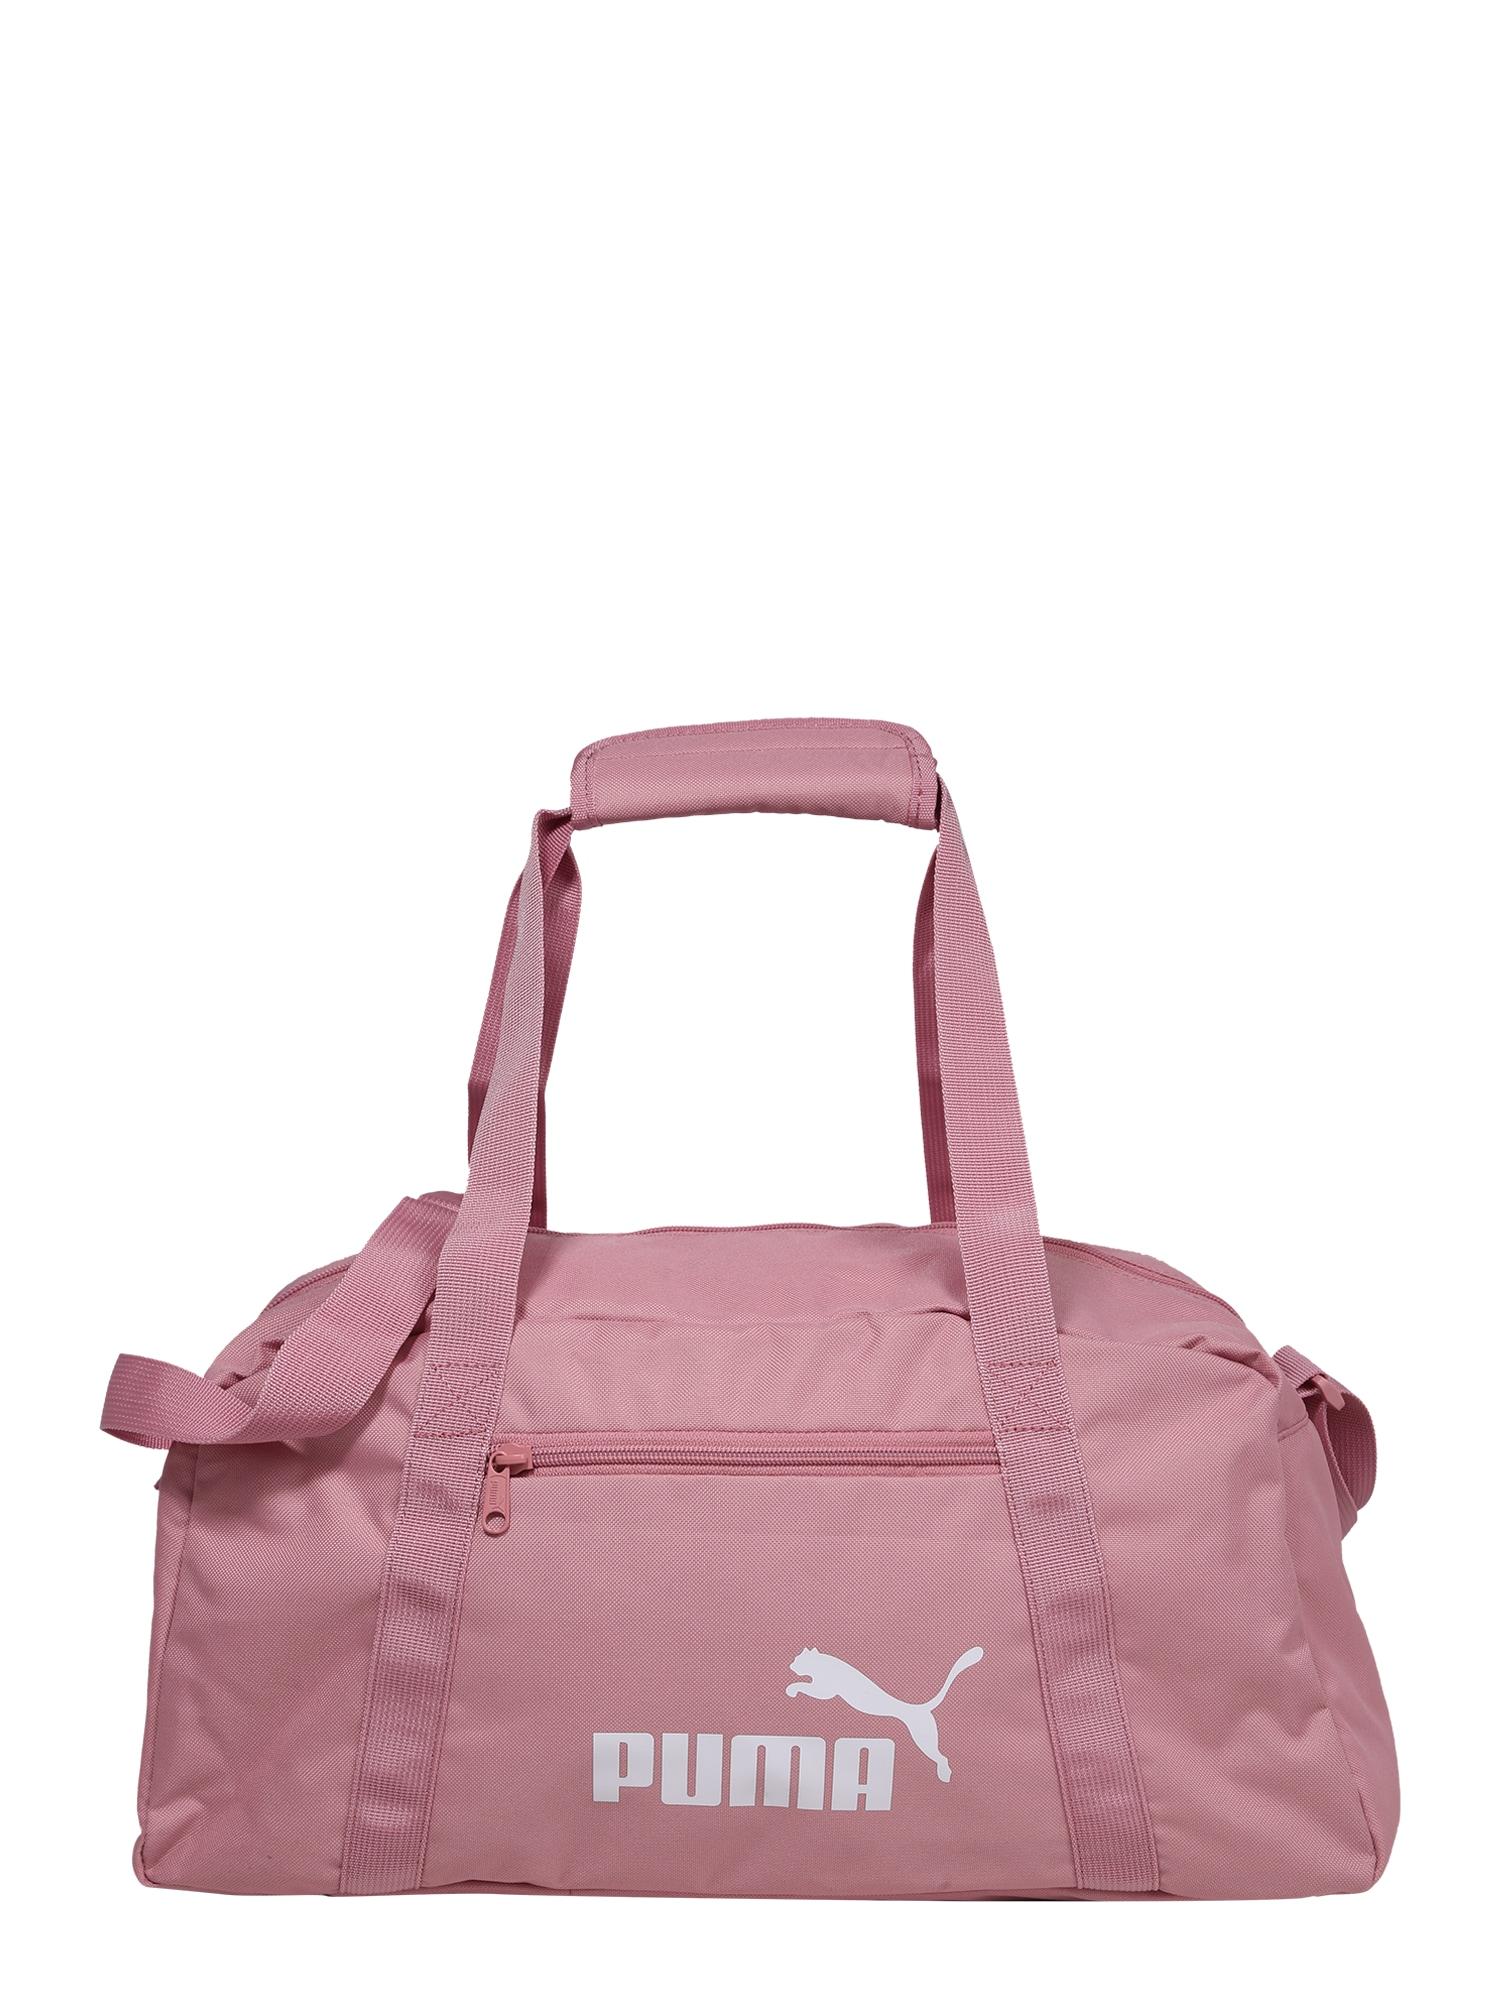 PUMA Sportovní taška 'Phase'  růžová / bílá